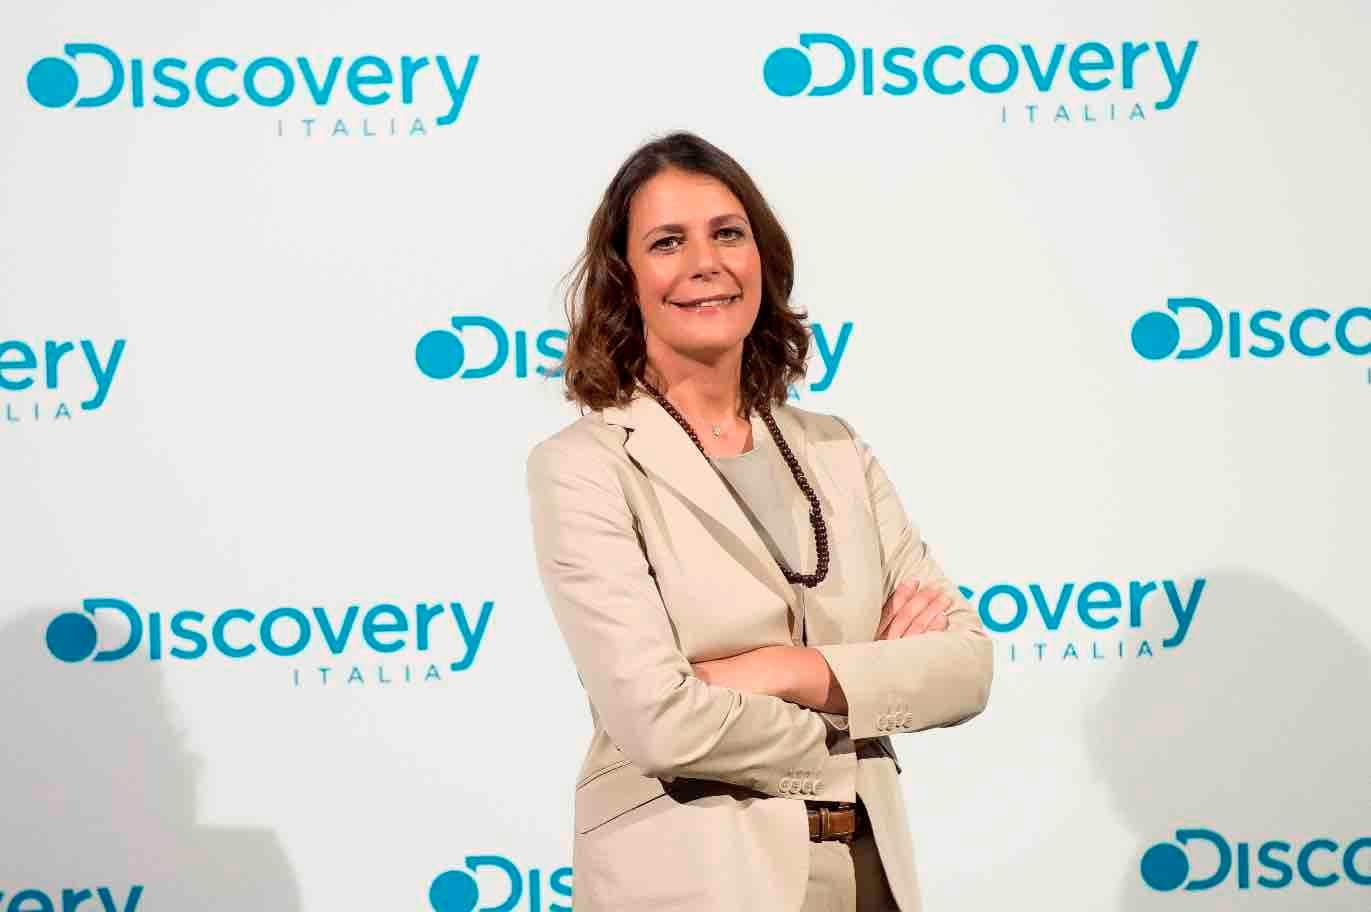 Marinella Soldi - Discovery